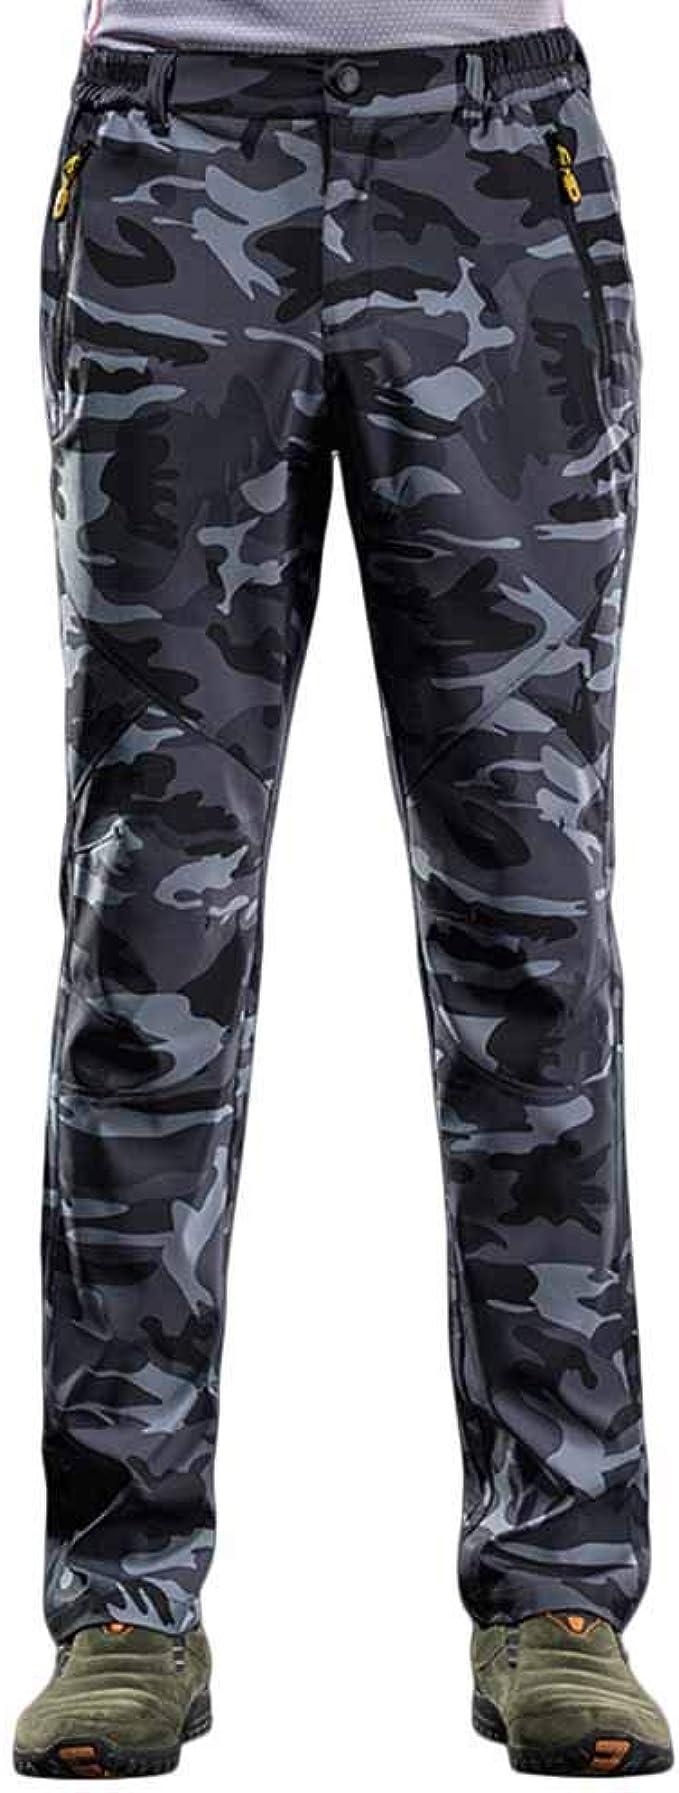 Quge Hombre Mujer Pantalones De Trekking Impermeables ...